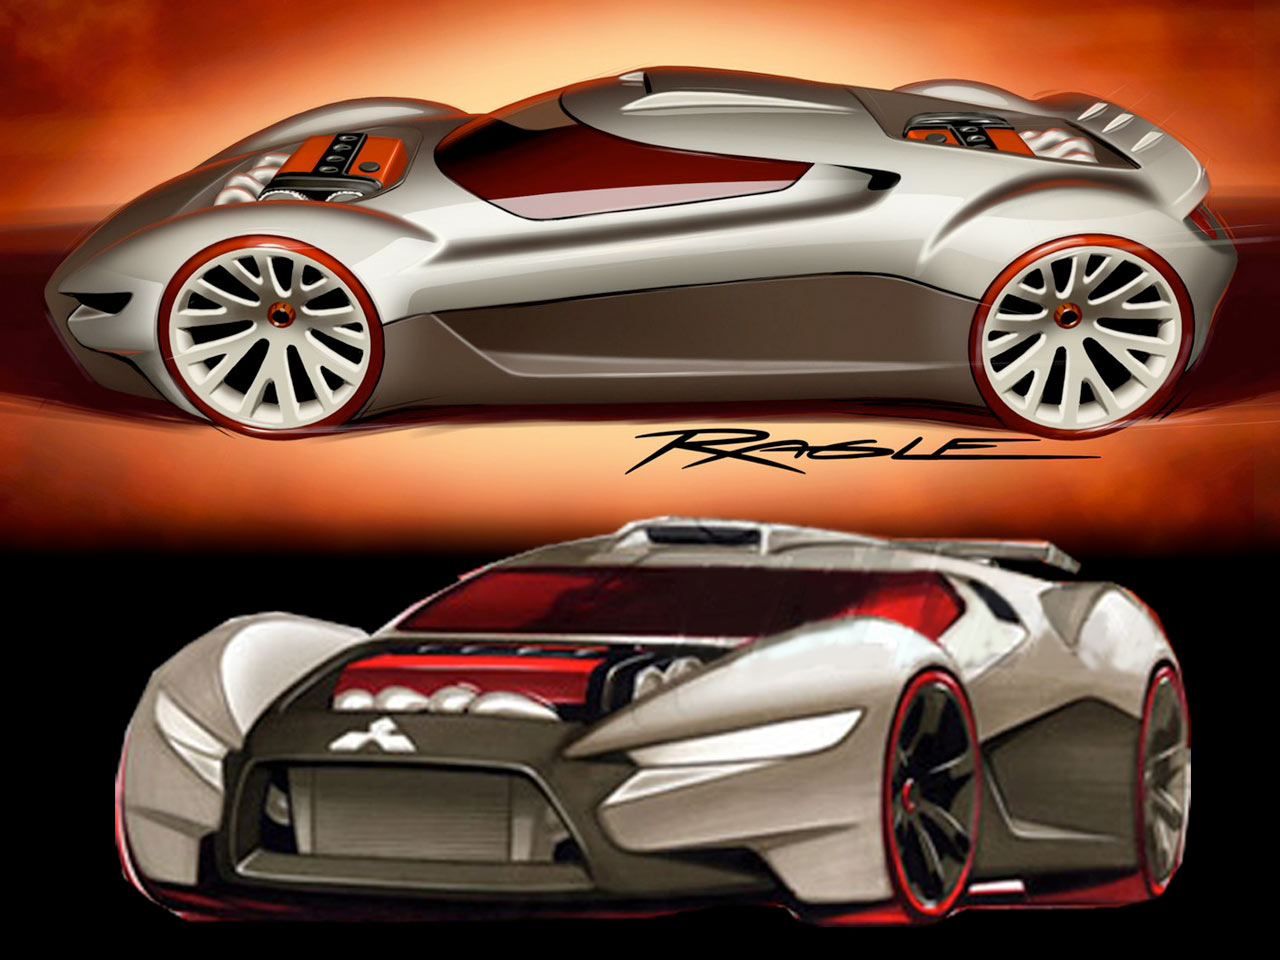 Autocar Hot Hatch 2020 Design Competition - Car Body Design